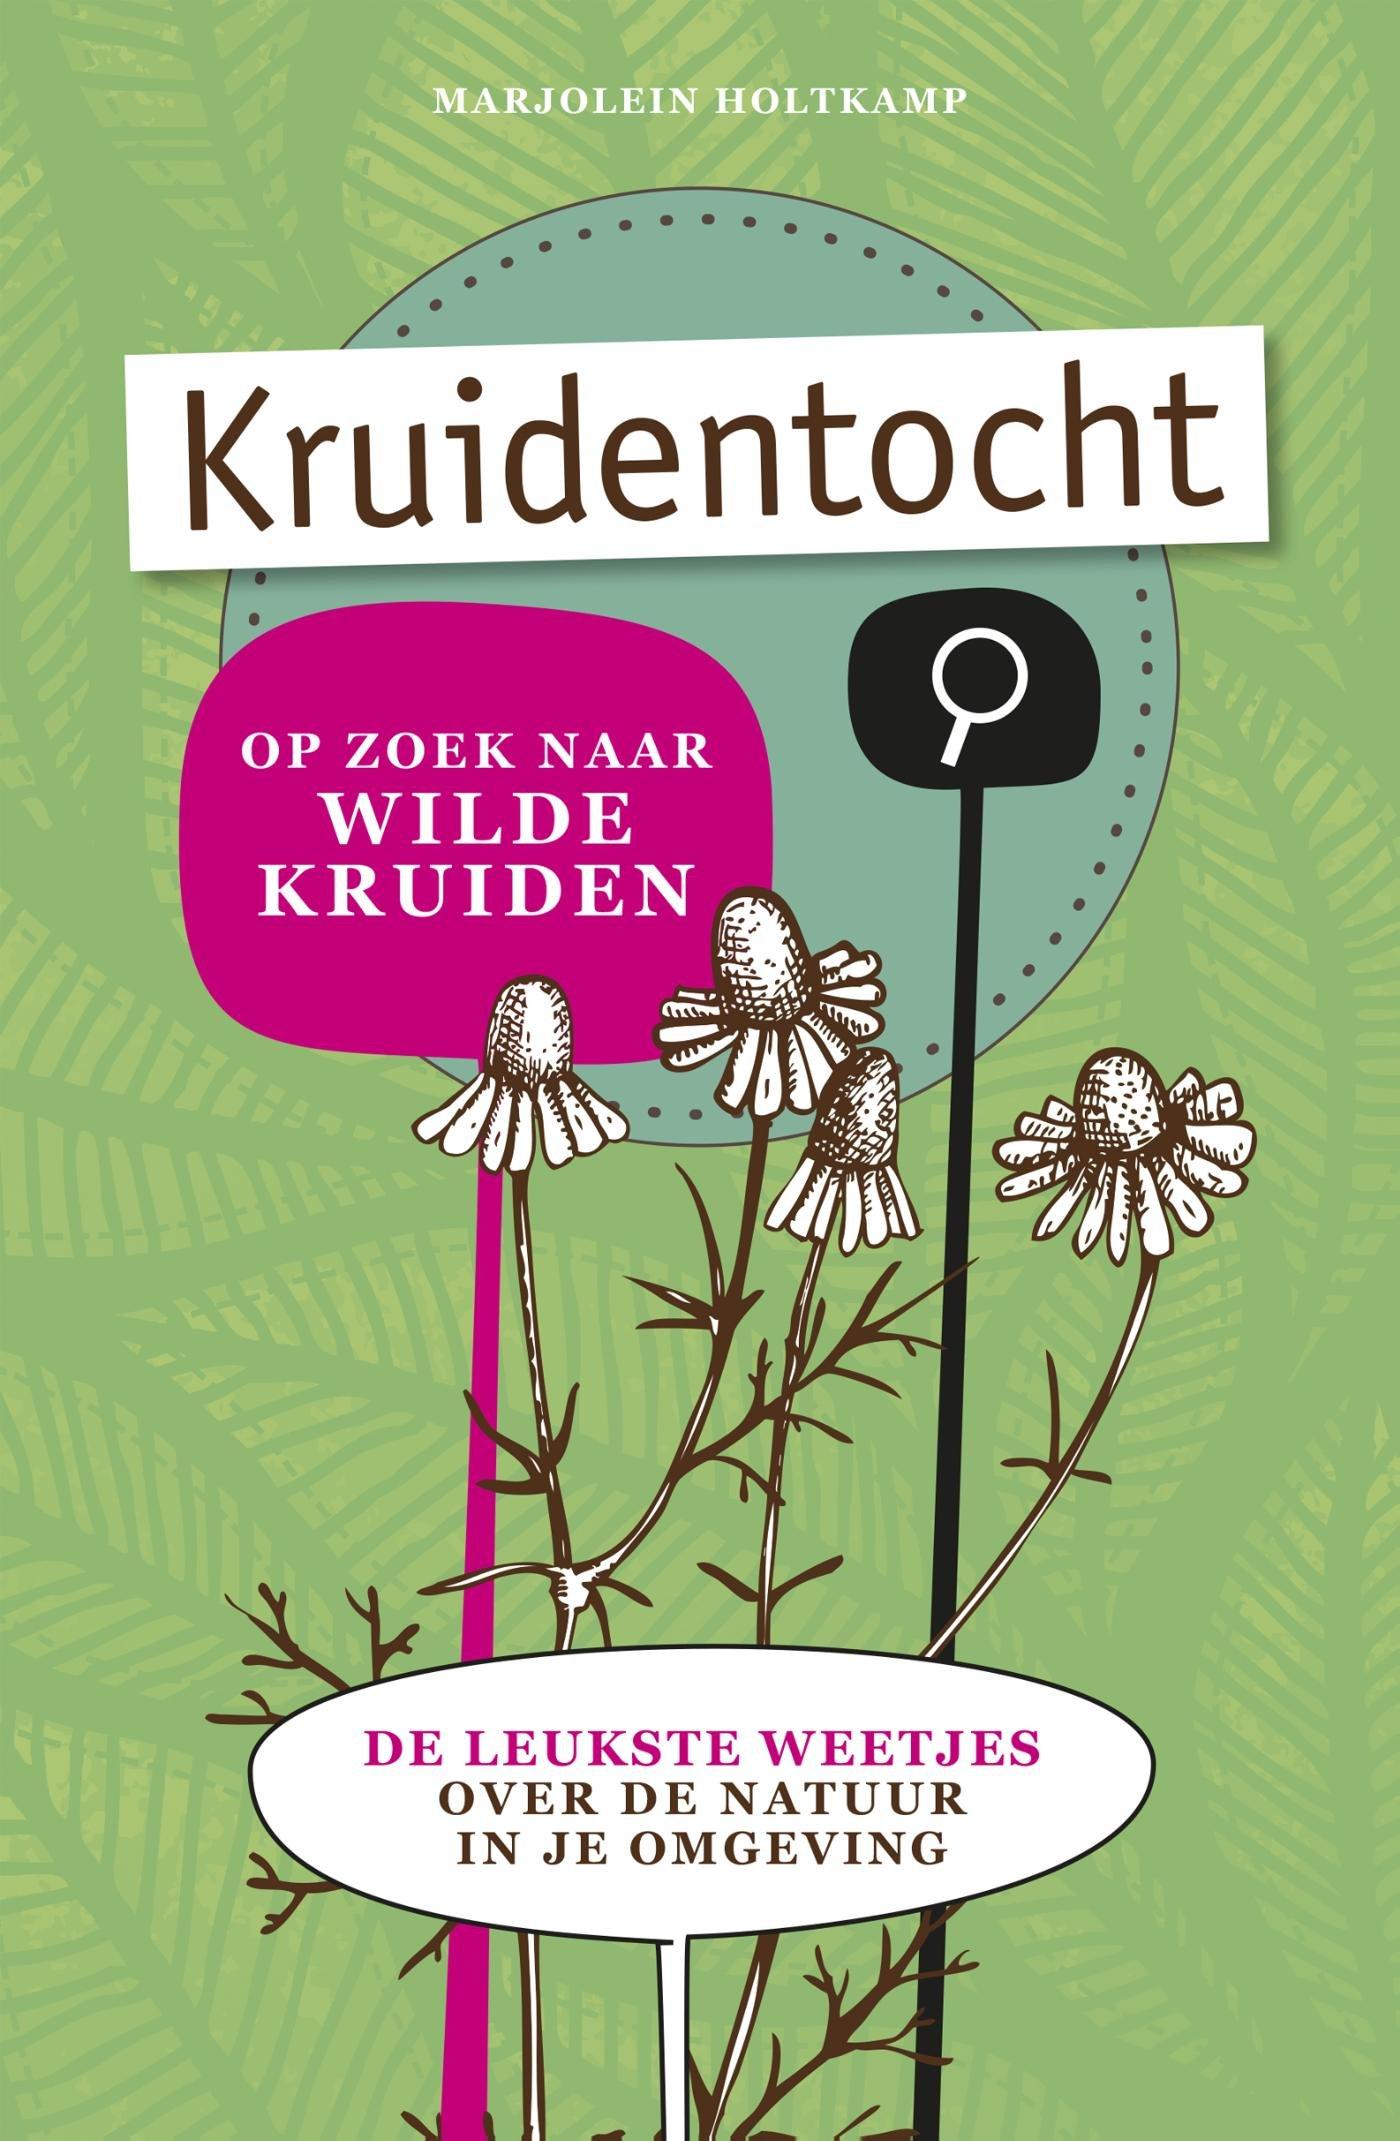 Kruidentocht 9789021564708 Marjolein Holtkamp Kosmos   Kinderboeken, Natuurgidsen Nederland